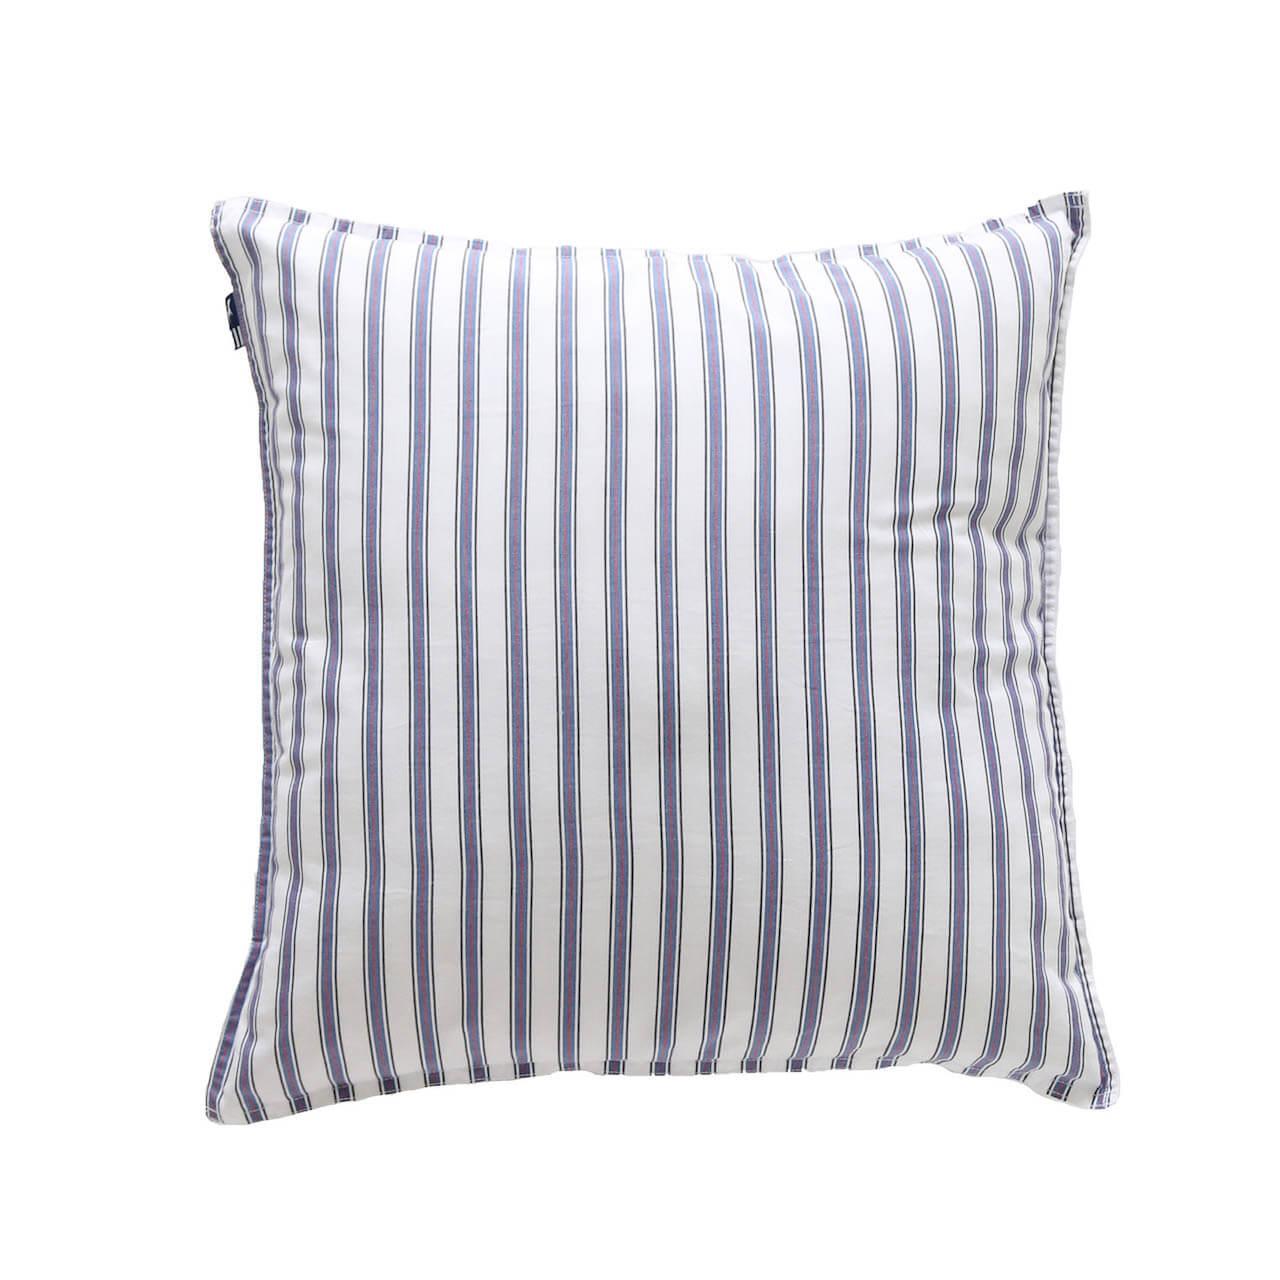 perkal kissenbezug nelson 50x50 cm homesphere onlineshop f r heimtextilien und mehr. Black Bedroom Furniture Sets. Home Design Ideas